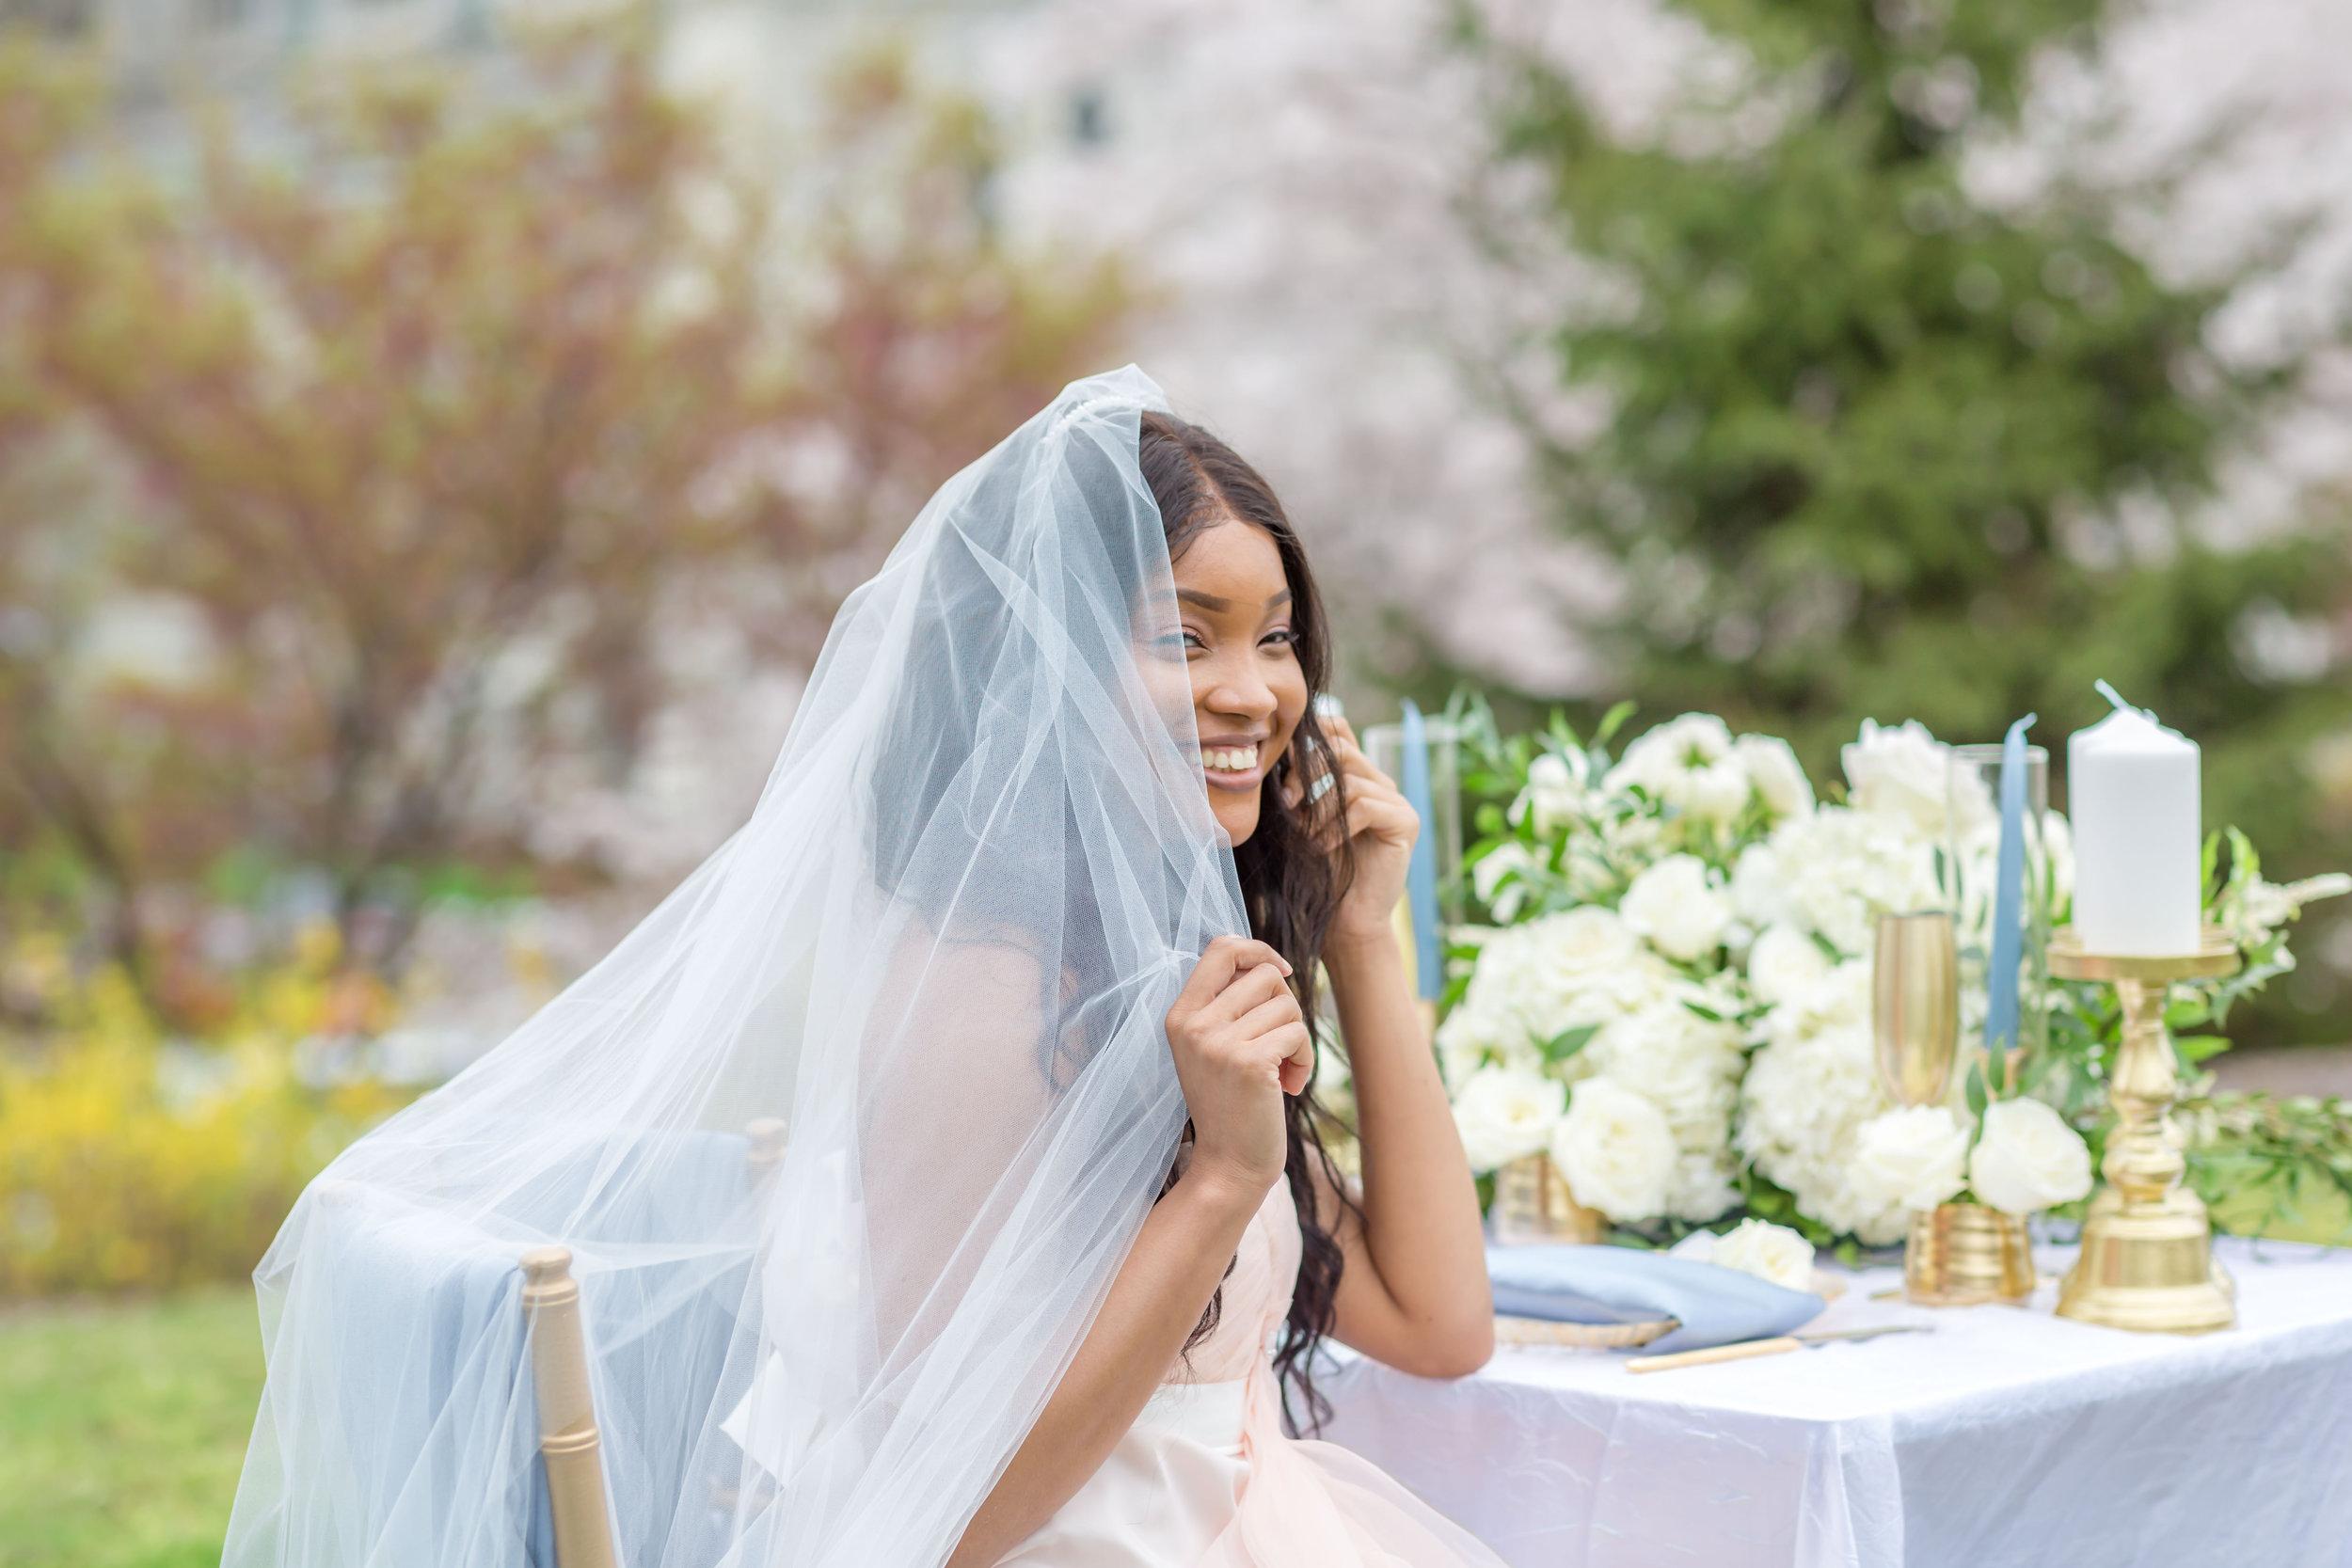 ScarlettExpressions-StyledShoot-Bridal-101.jpg